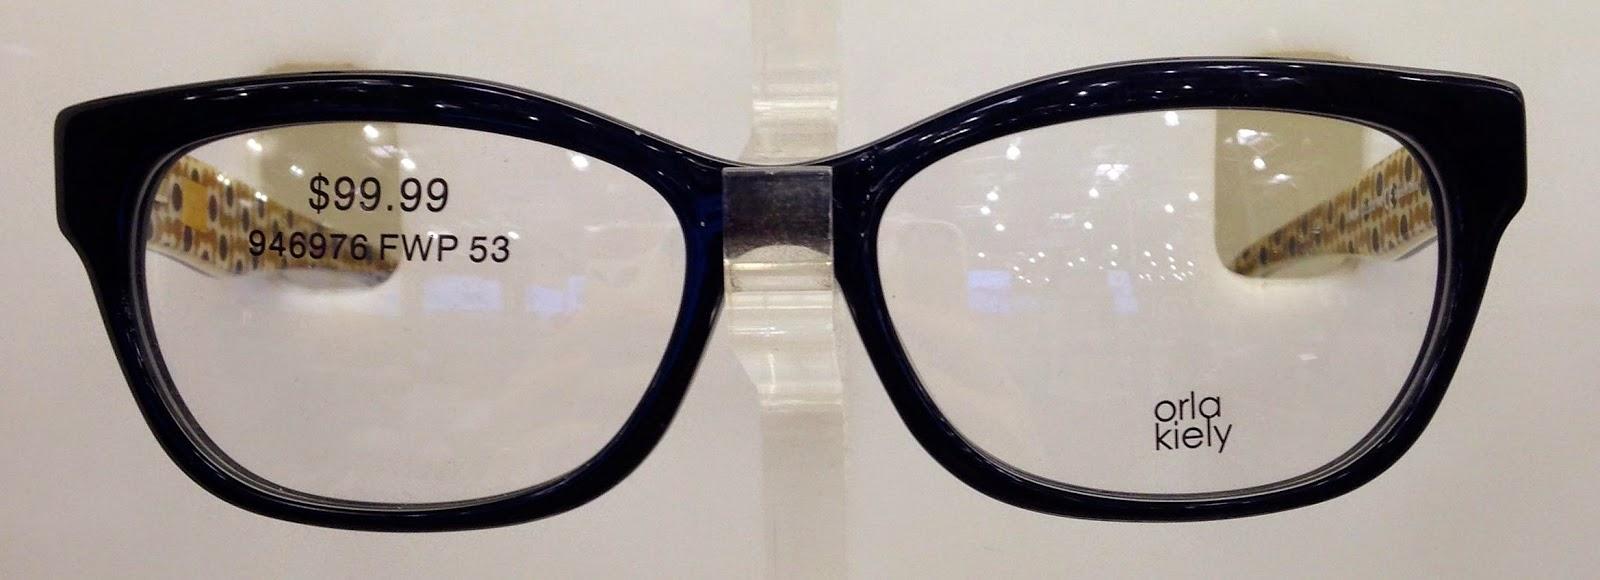 Brillen Frames Repertorium van Brillen amp Accessoires